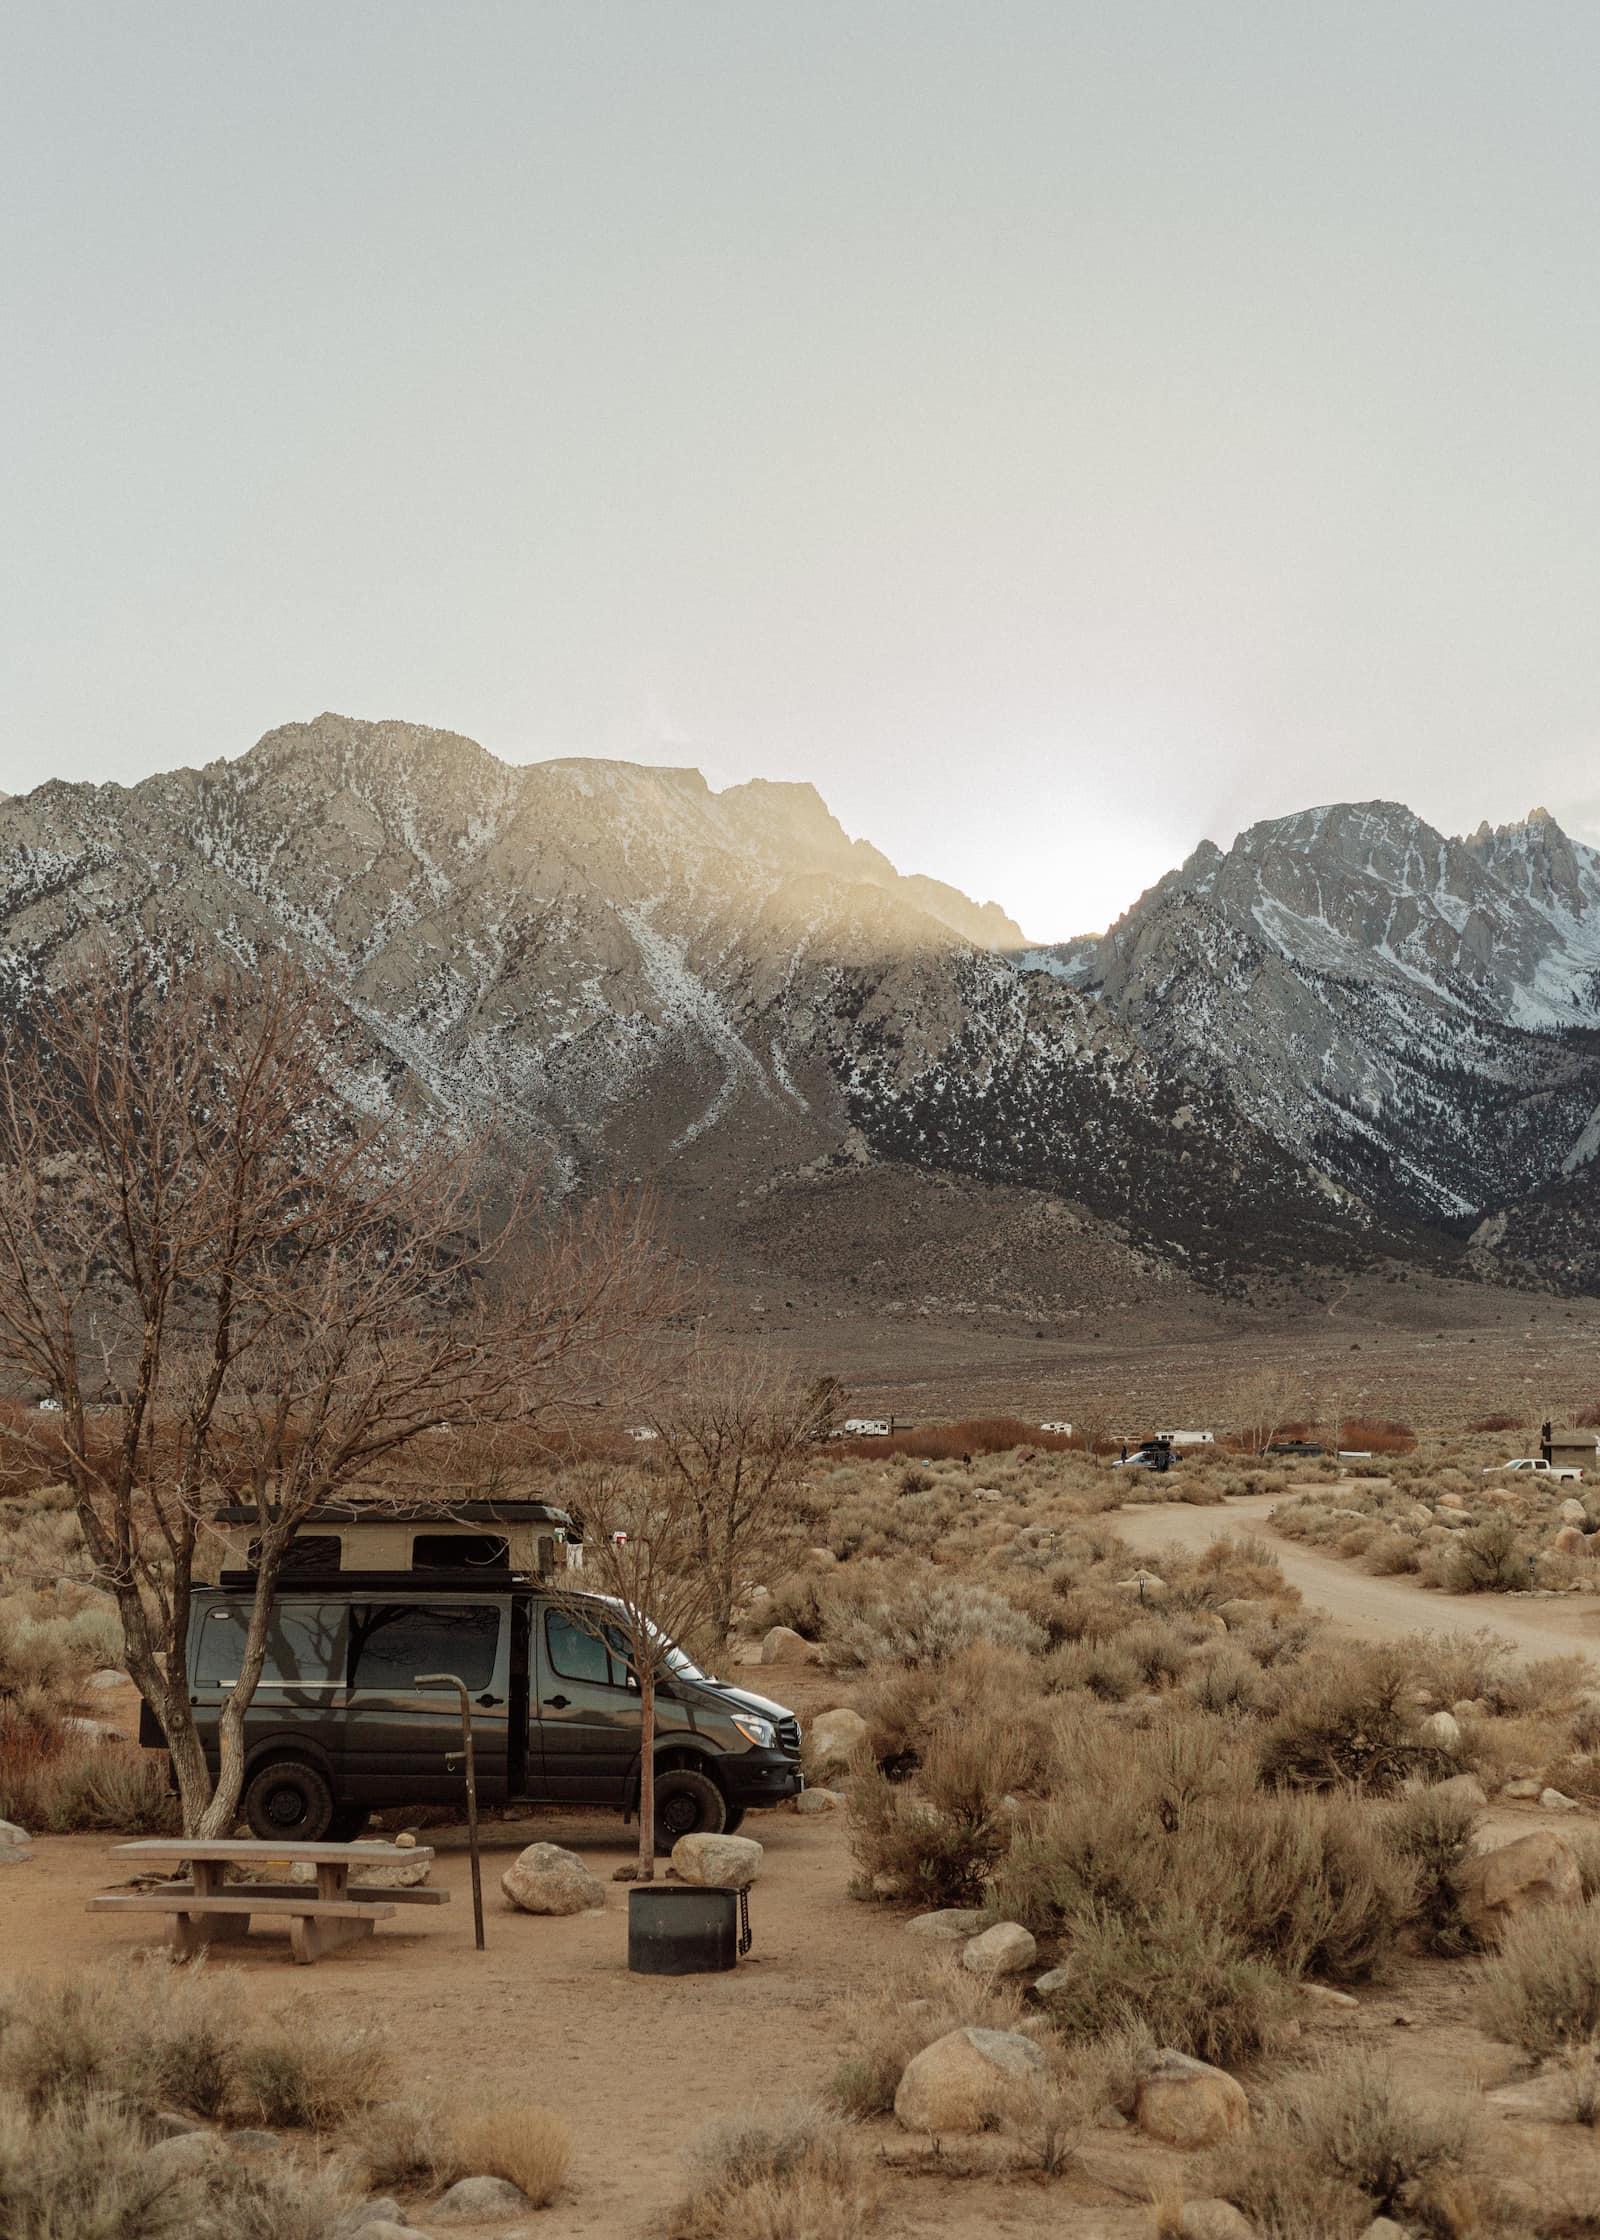 Van parked in the desert below snow covered Alabama Hills.